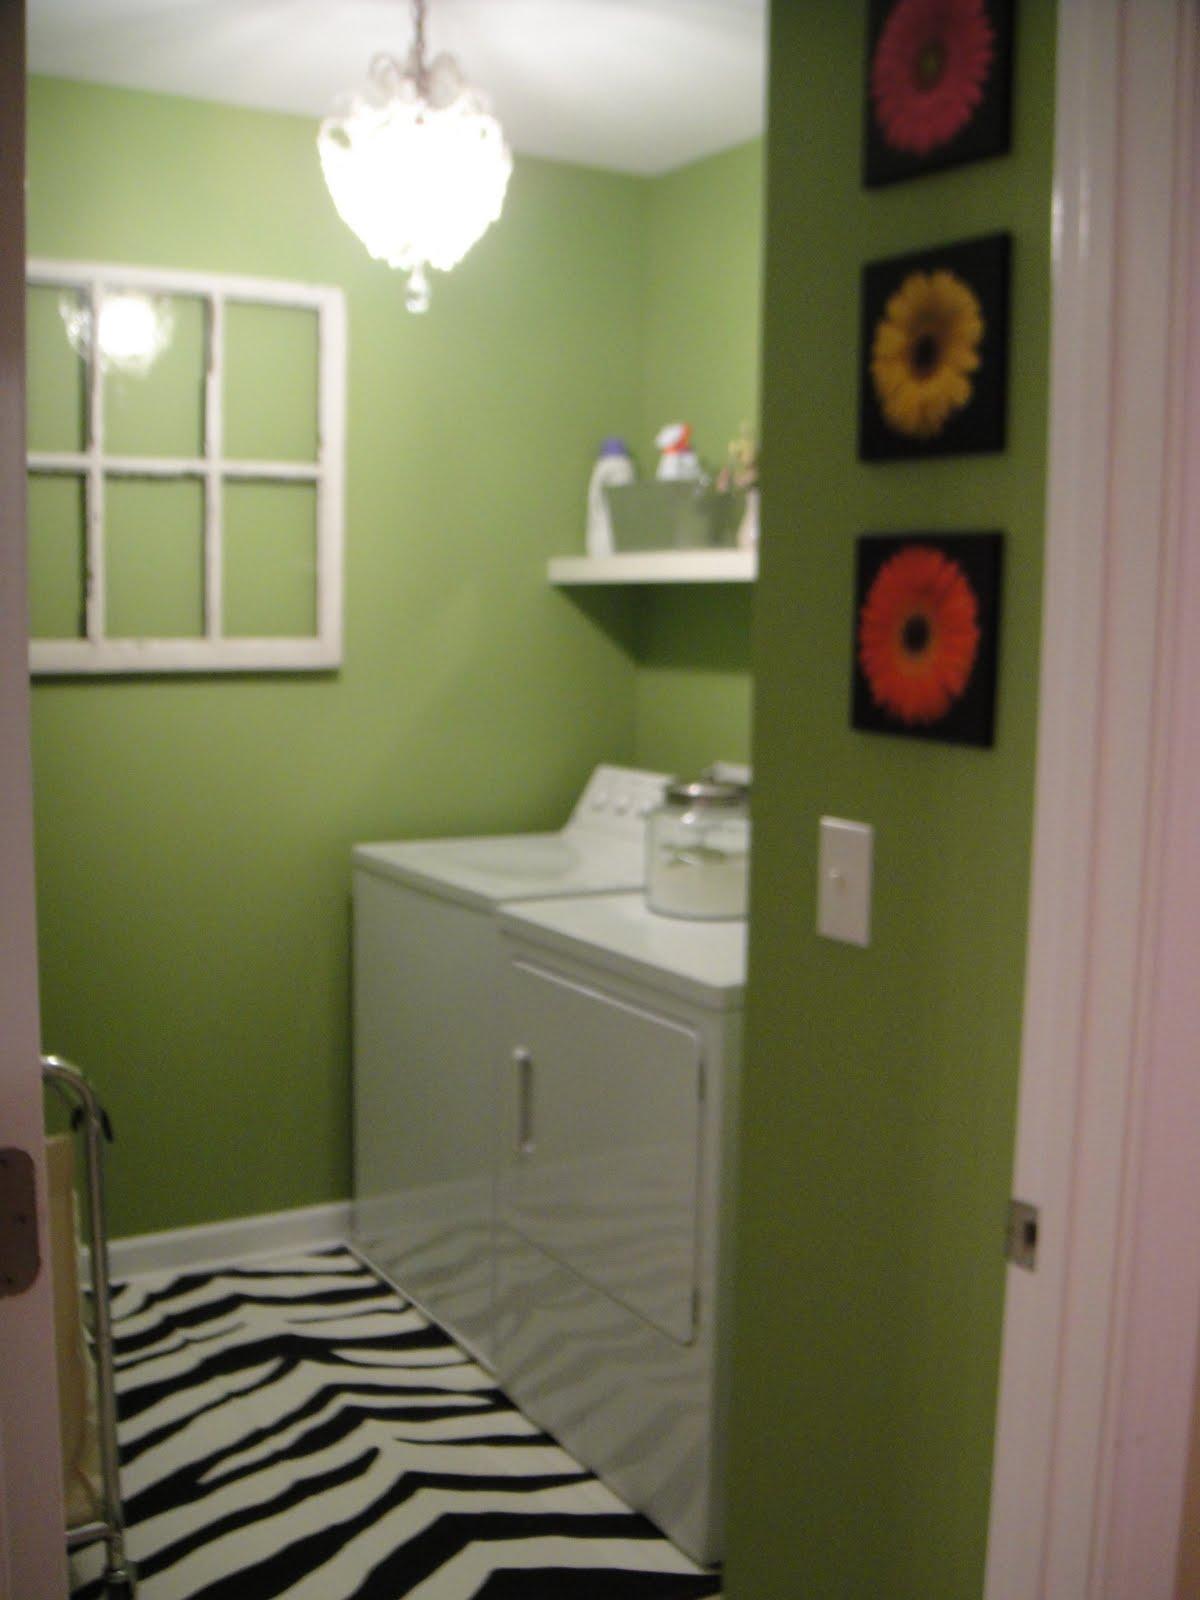 comfy cozy nest my laundry room